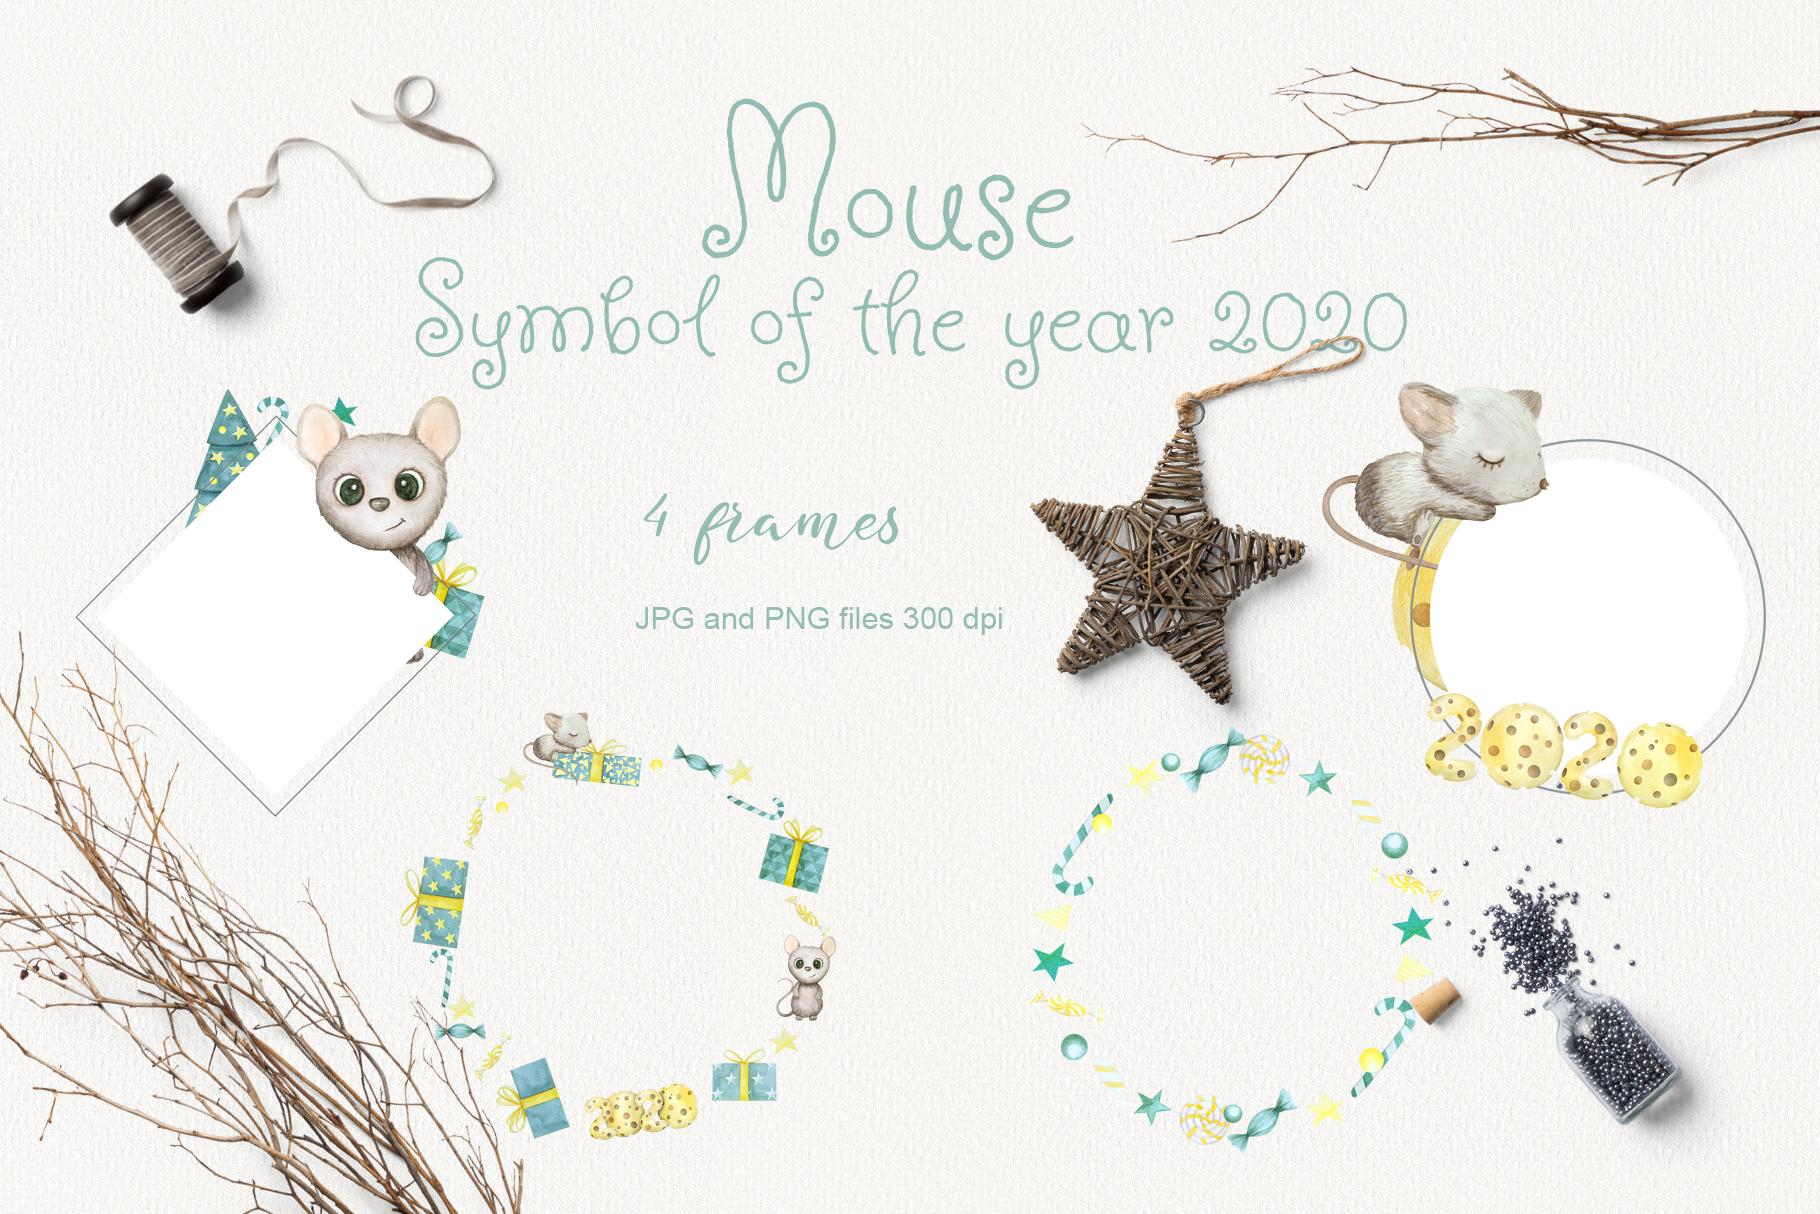 2020手绘鼠年卡通老鼠图案图标水彩插画素材合集节日背景Mouse. New Year 2020. Watercolor set